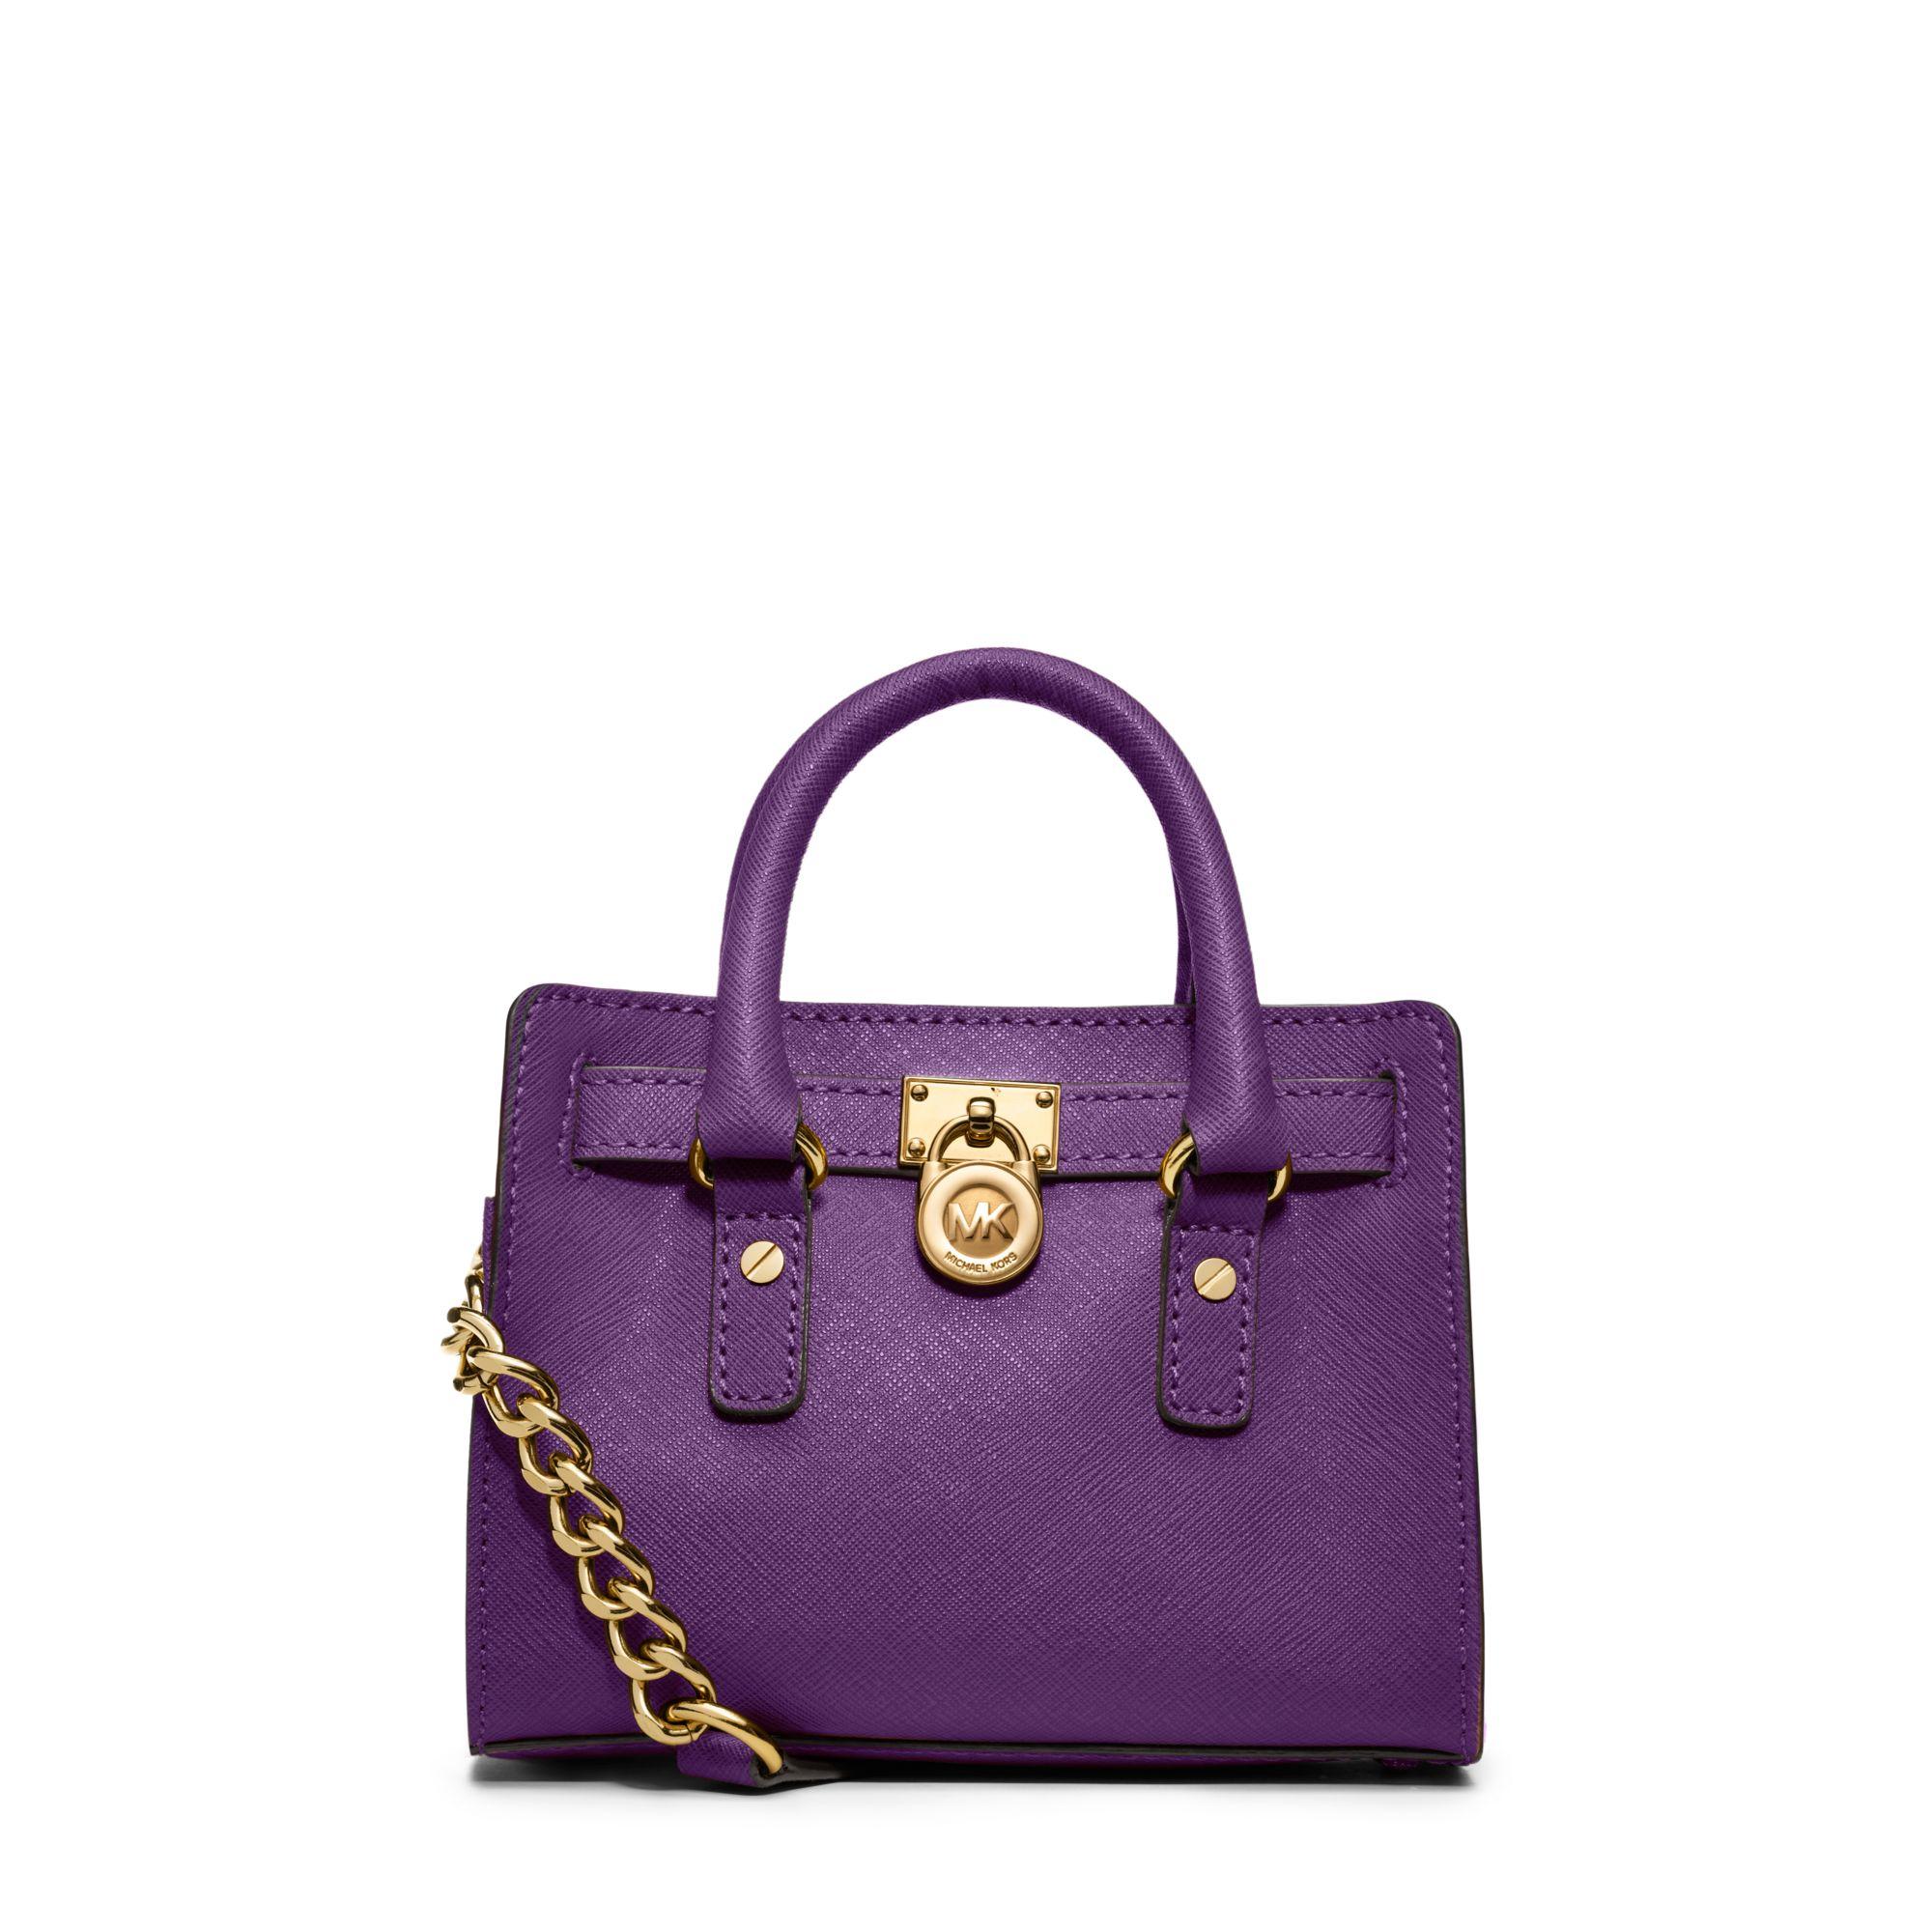 0a361c8345d9 Lyst - Michael Kors Hamilton Saffiano Leather Mini Messenger in Purple